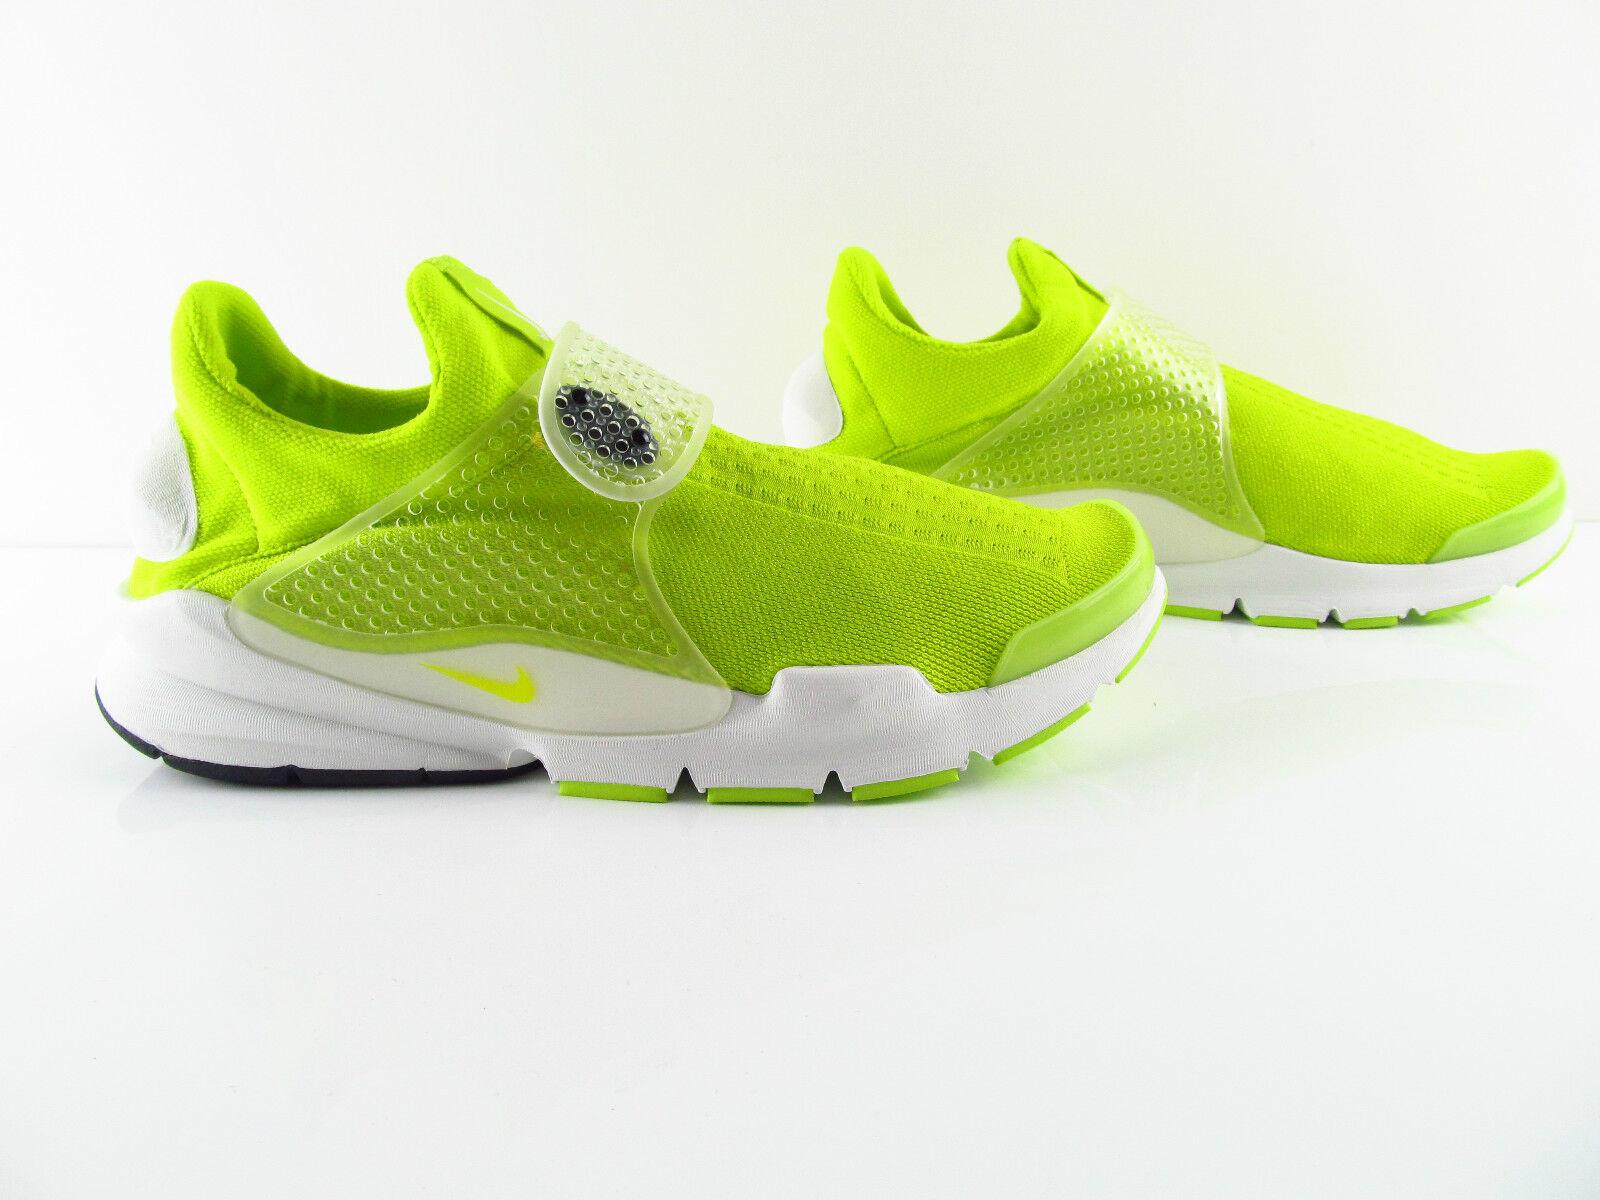 Nike Neon Sock Dart sp nikelab Neon Nike Amarillo voltios Summit Blanco us_13 101a16